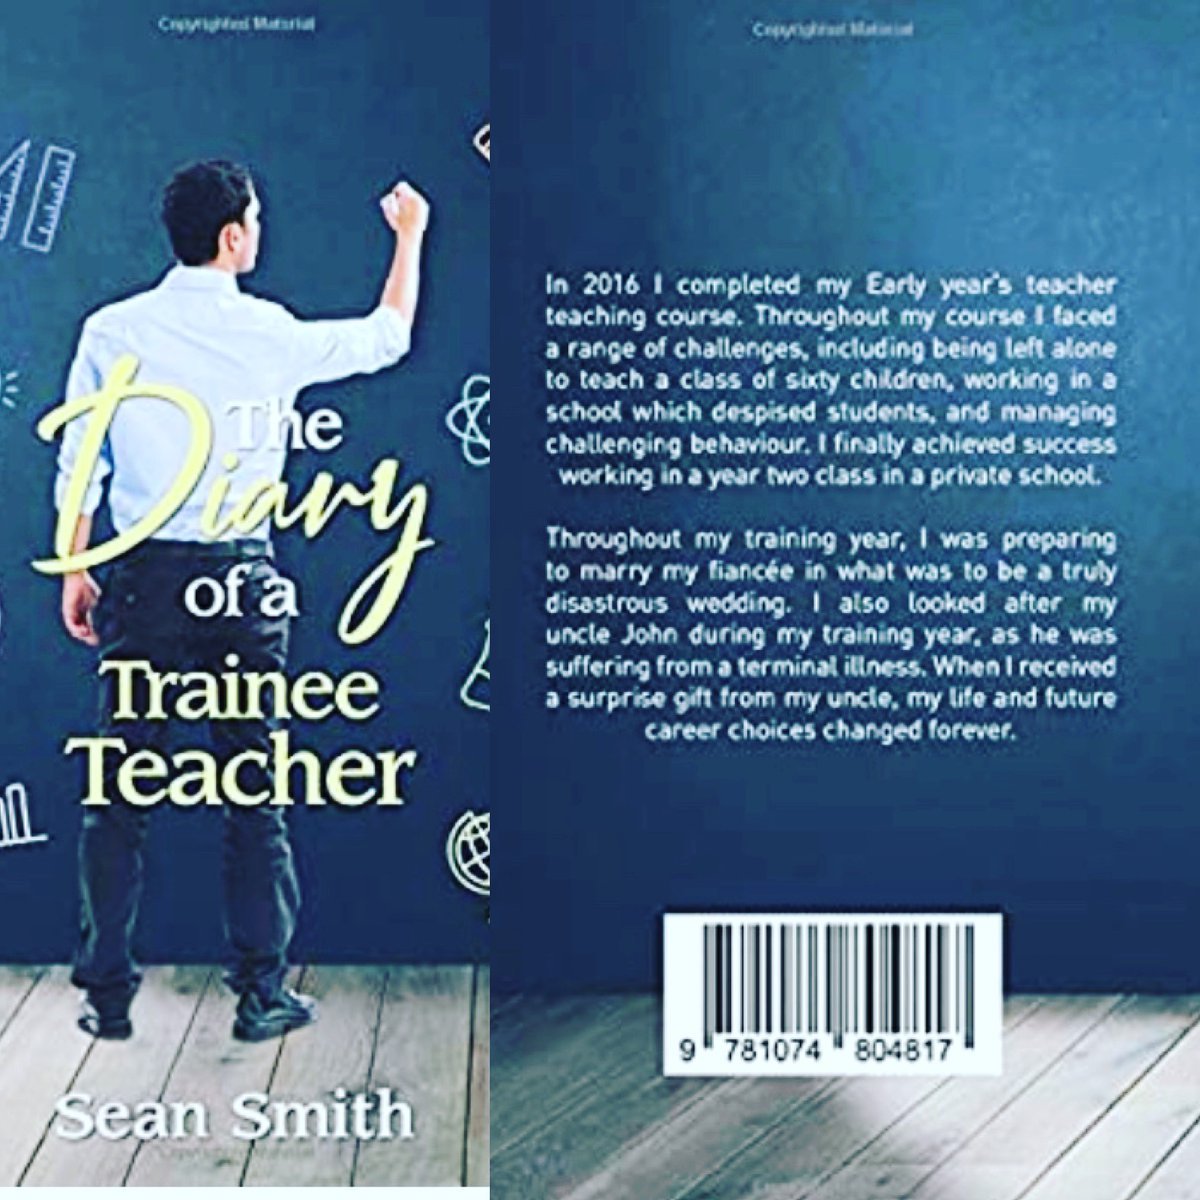 A #mustread #Teacher #PGCE #BookBoost #BookTwitter #edutwitter #homelearning #BookRecommendations      The diary of a trainee teacher by Sean Smith  via @AmazonUK